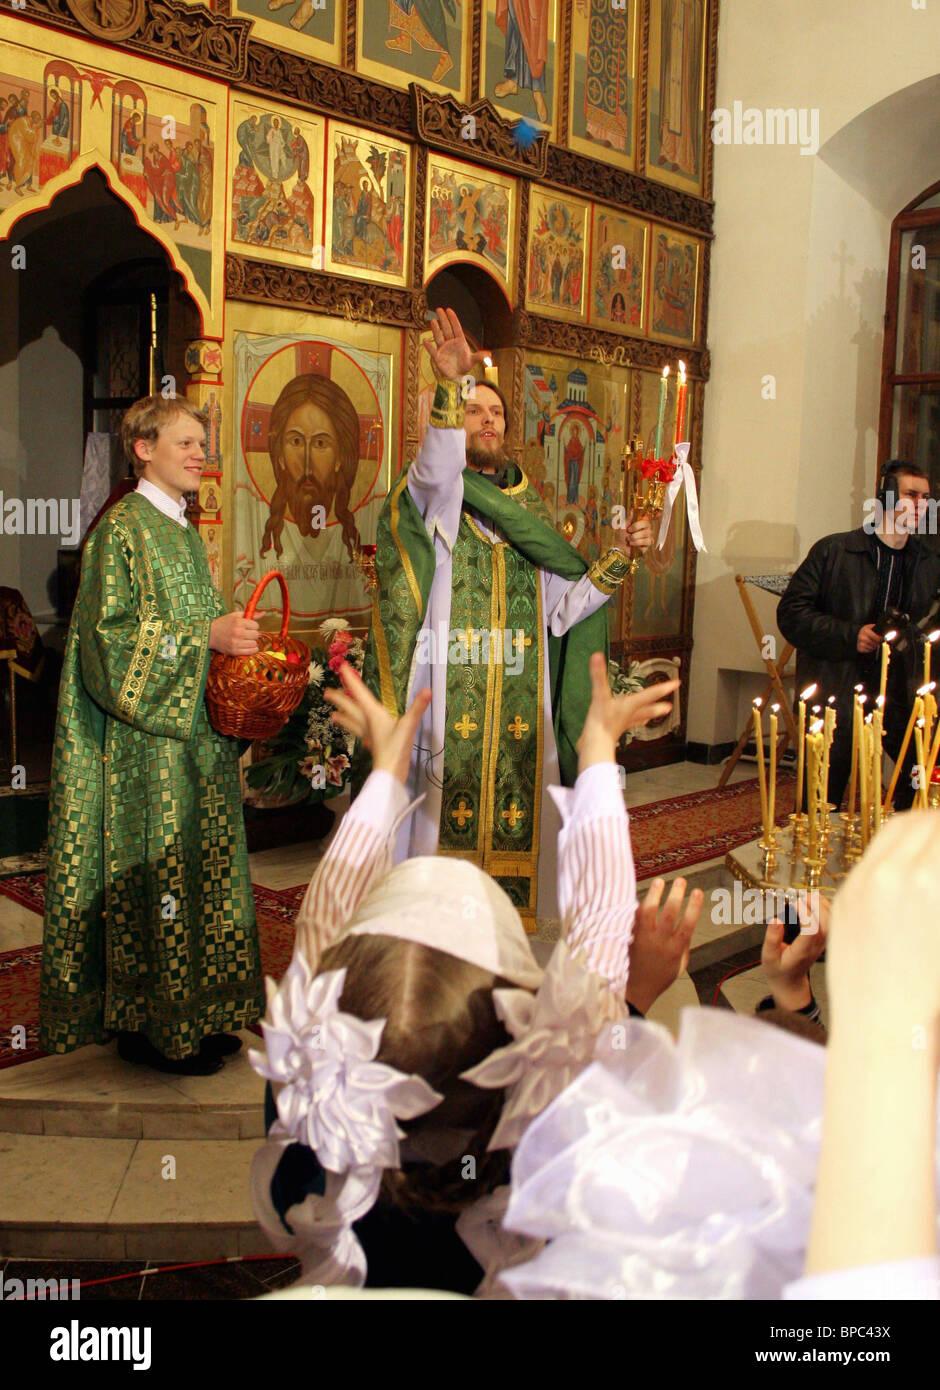 Orthodox Christians celebrate Easter on Sunday, April 23 - Stock Image